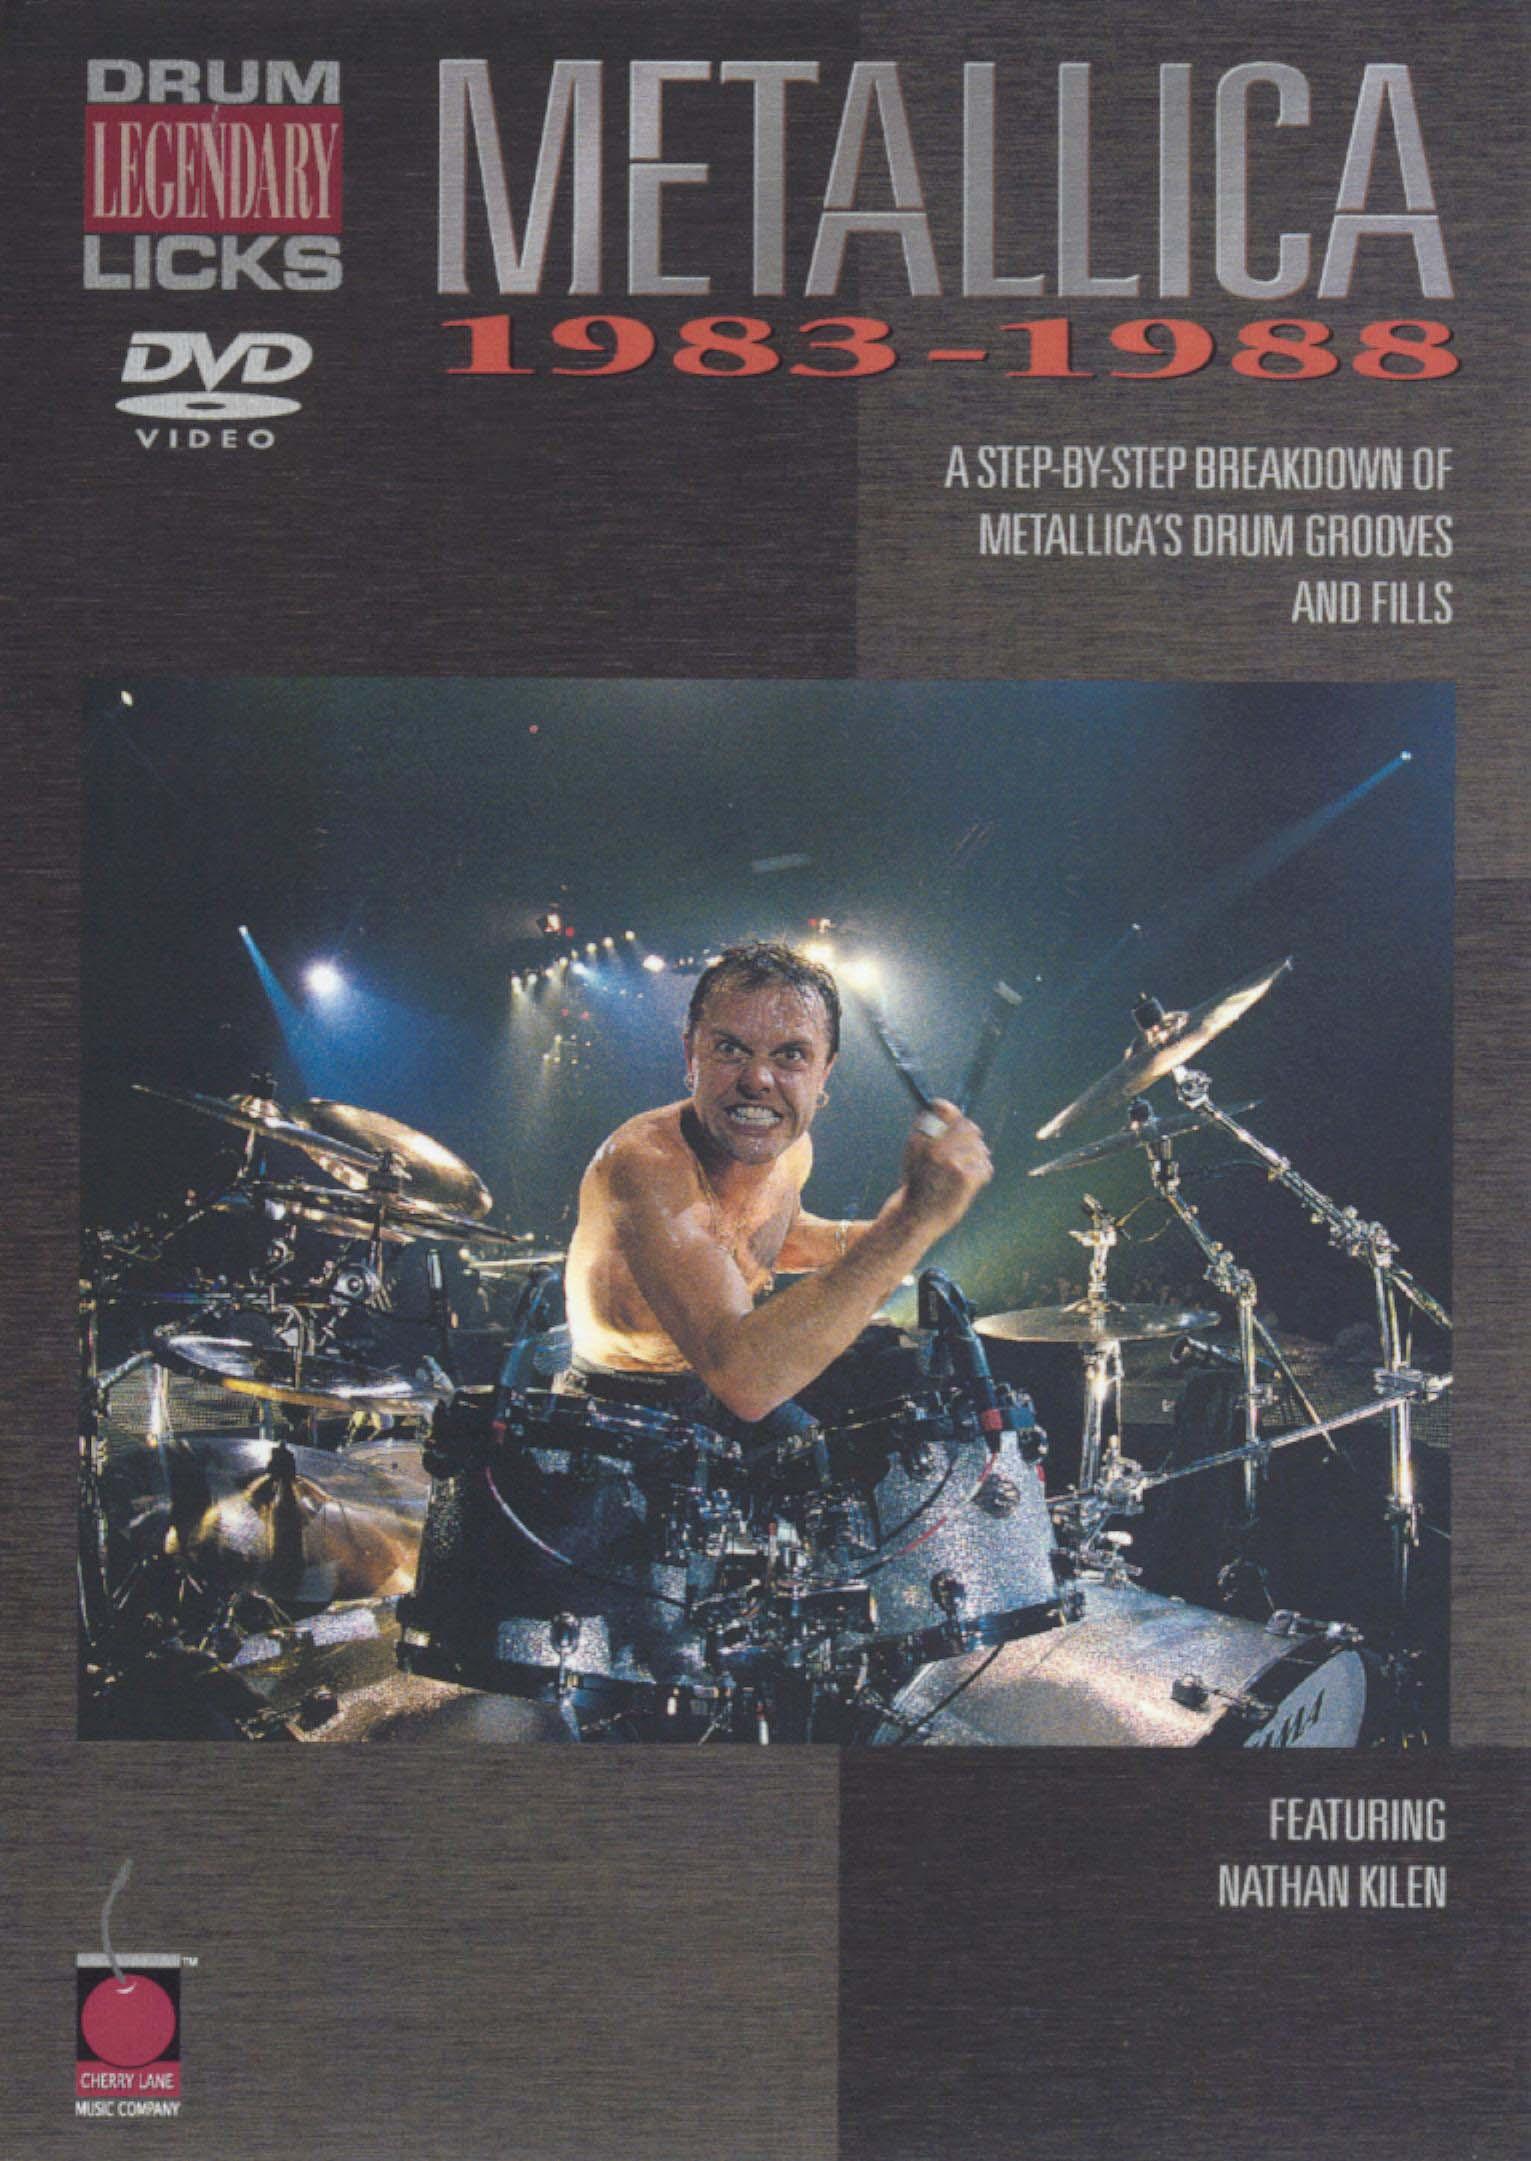 Metallica: Legendary Licks - Drum, 1983-1988